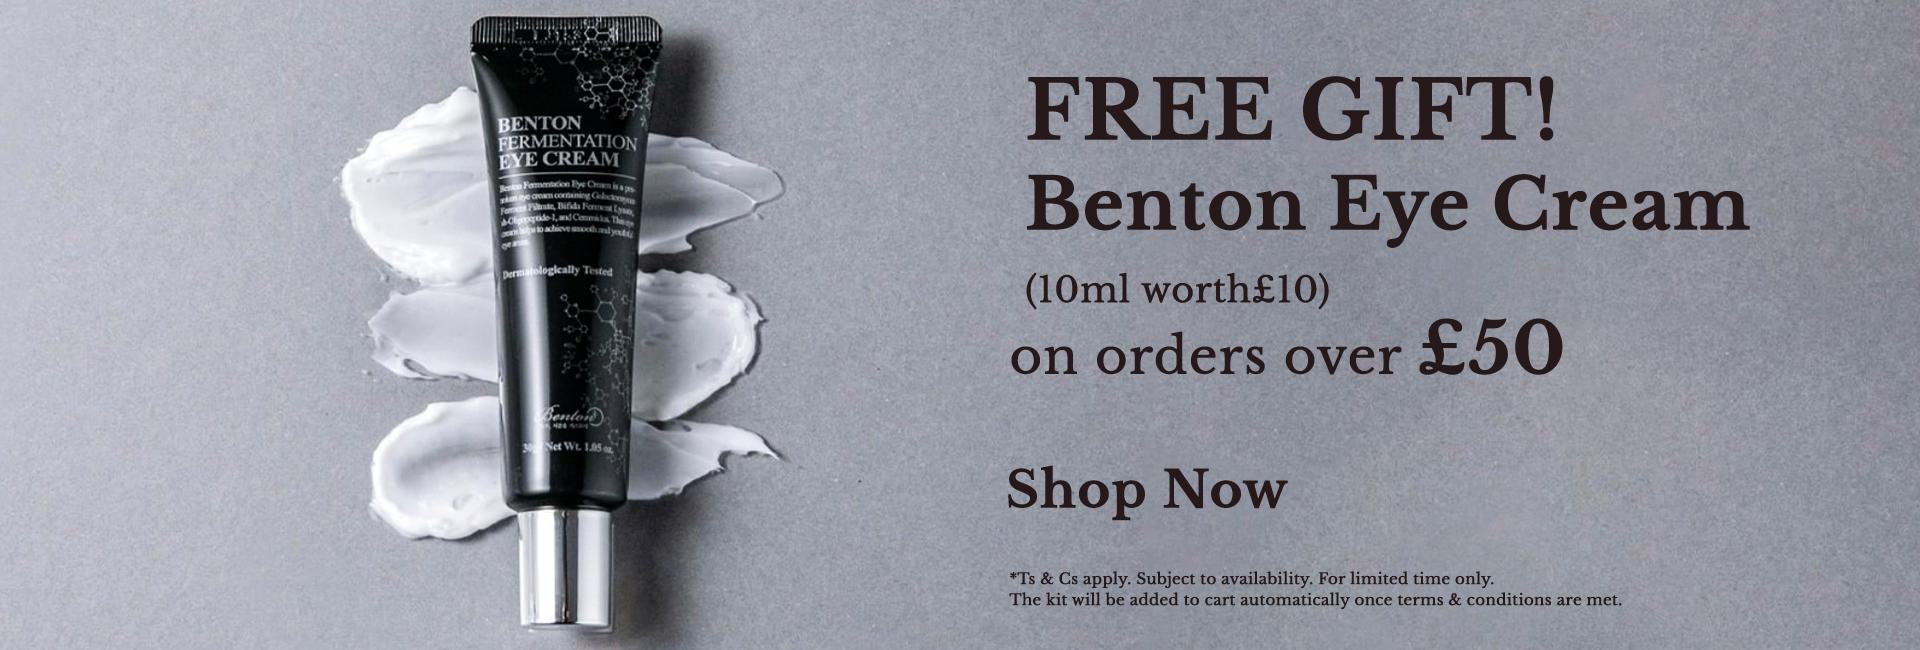 Free Benton Eye Cream